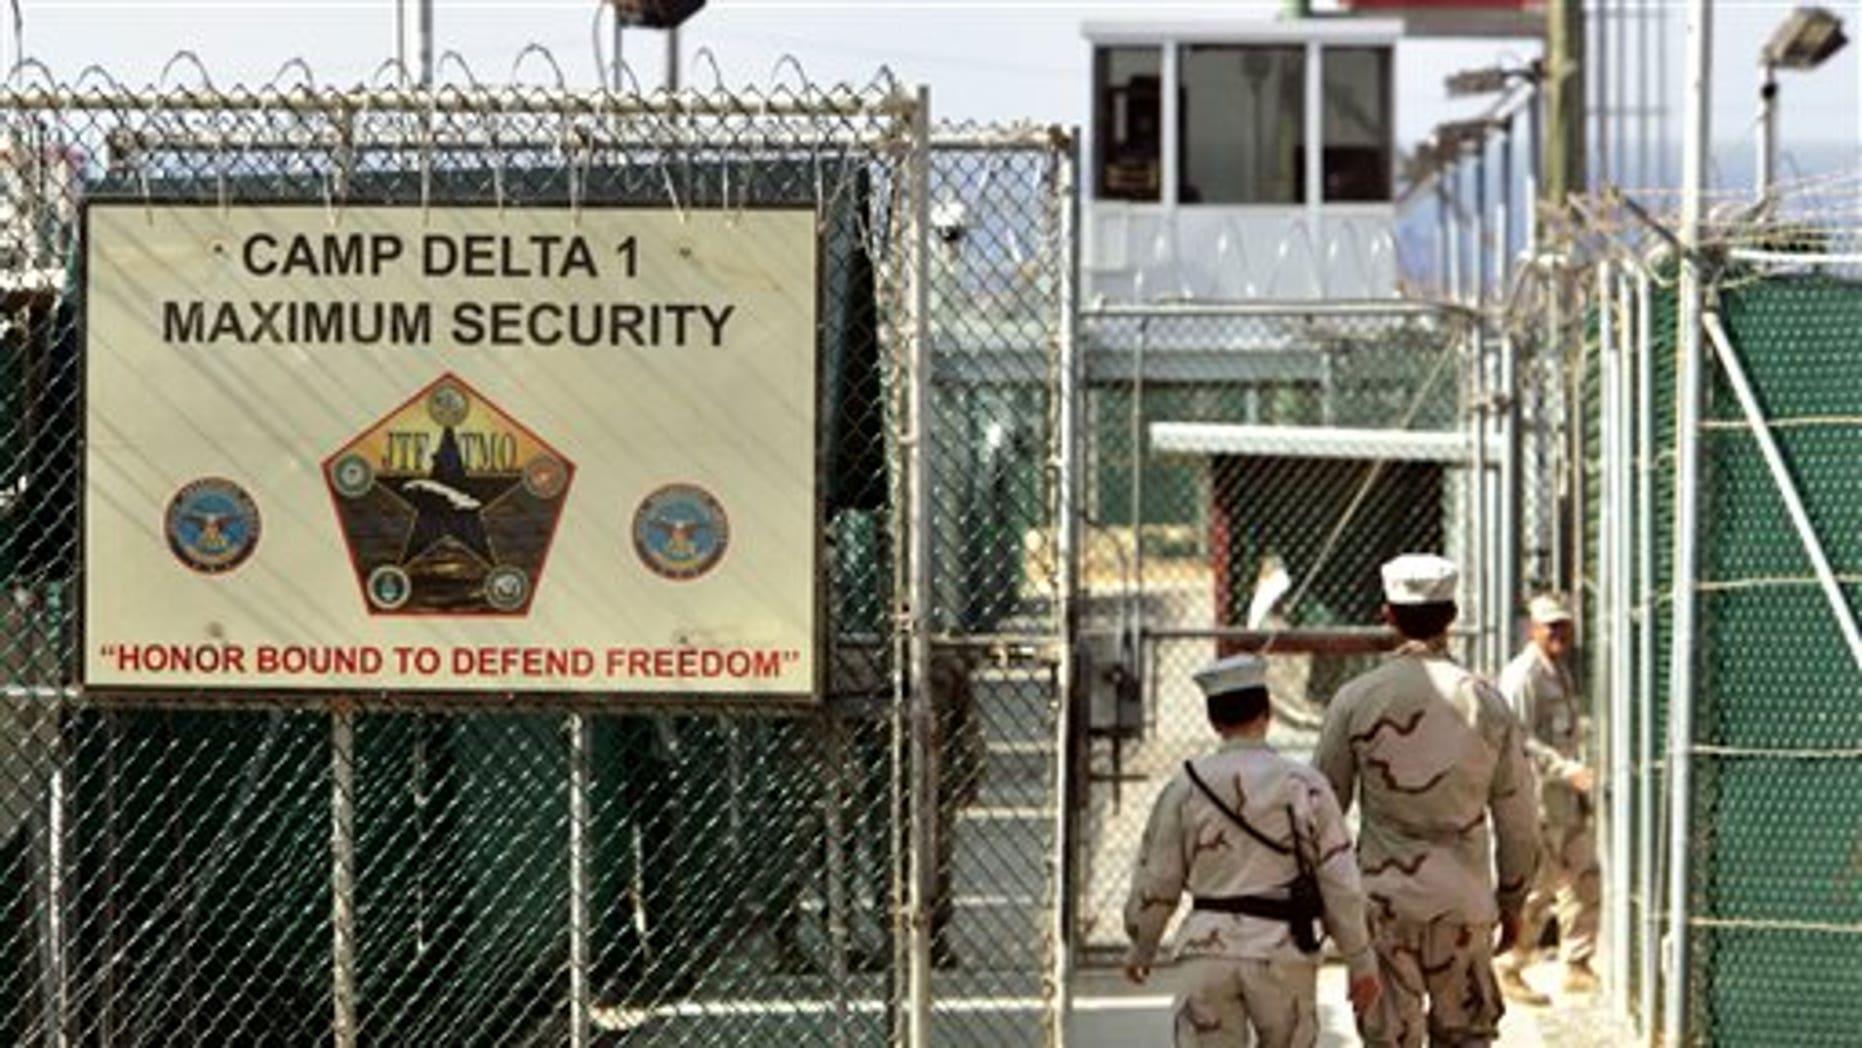 U.S. military guards walk within Camp Delta military-run prison, at the Guantanamo Bay U.S. Naval Base, Cuba.